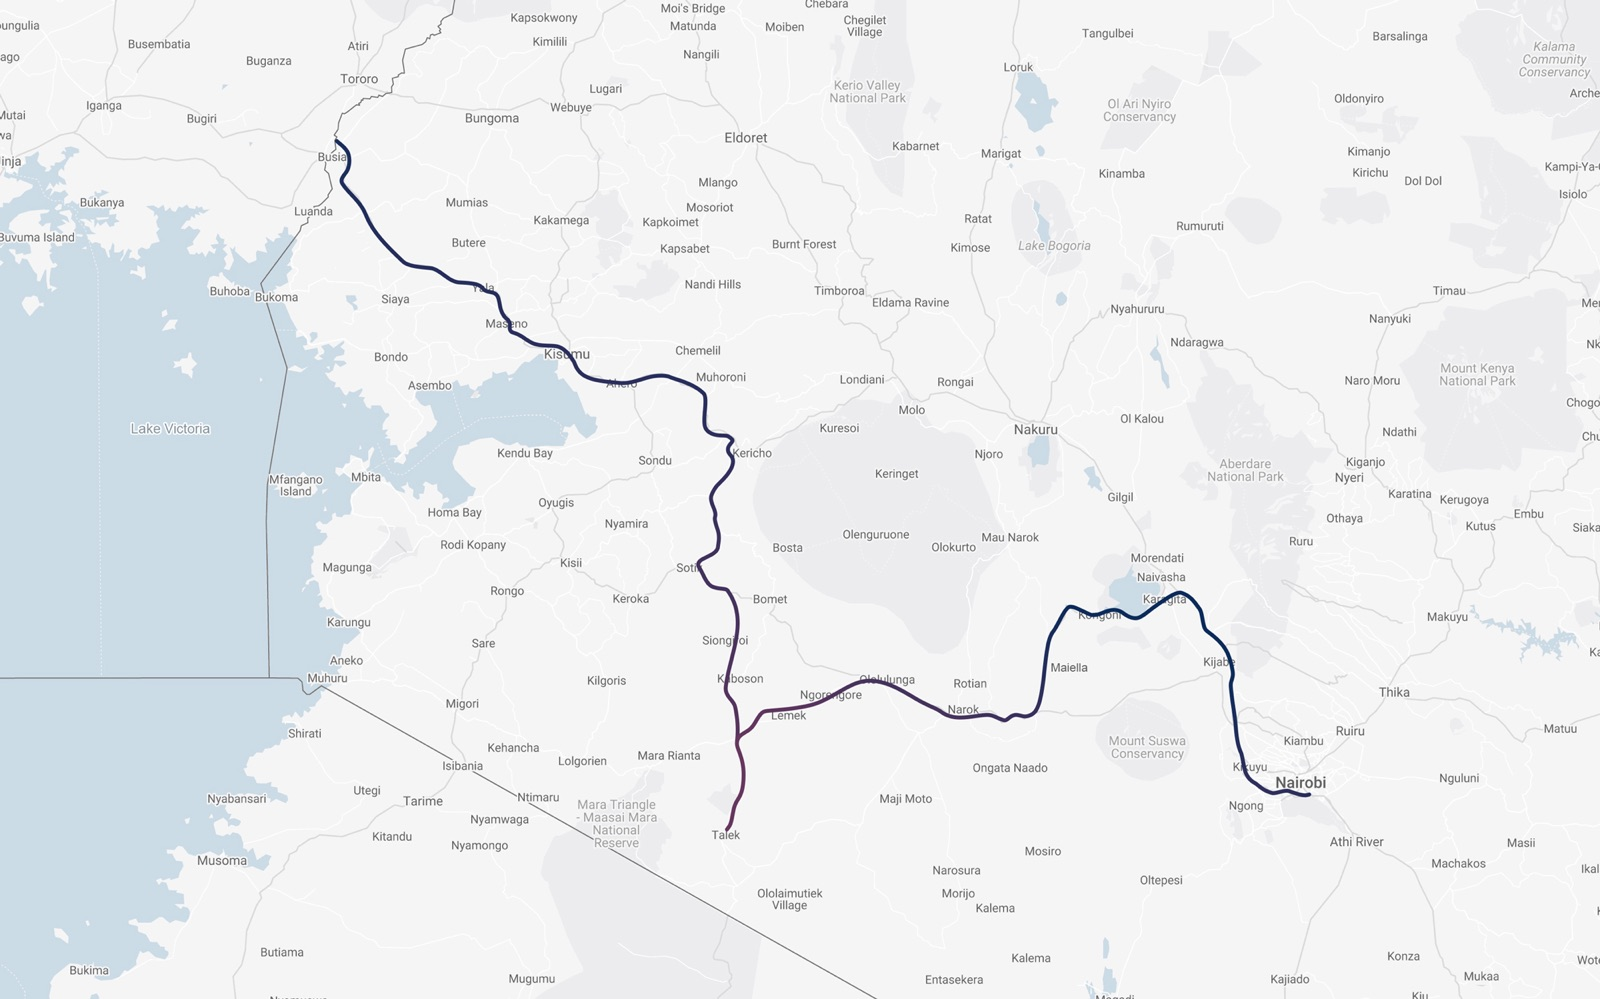 The-Slow-Race-Map-Kenya.jpg.jpeg